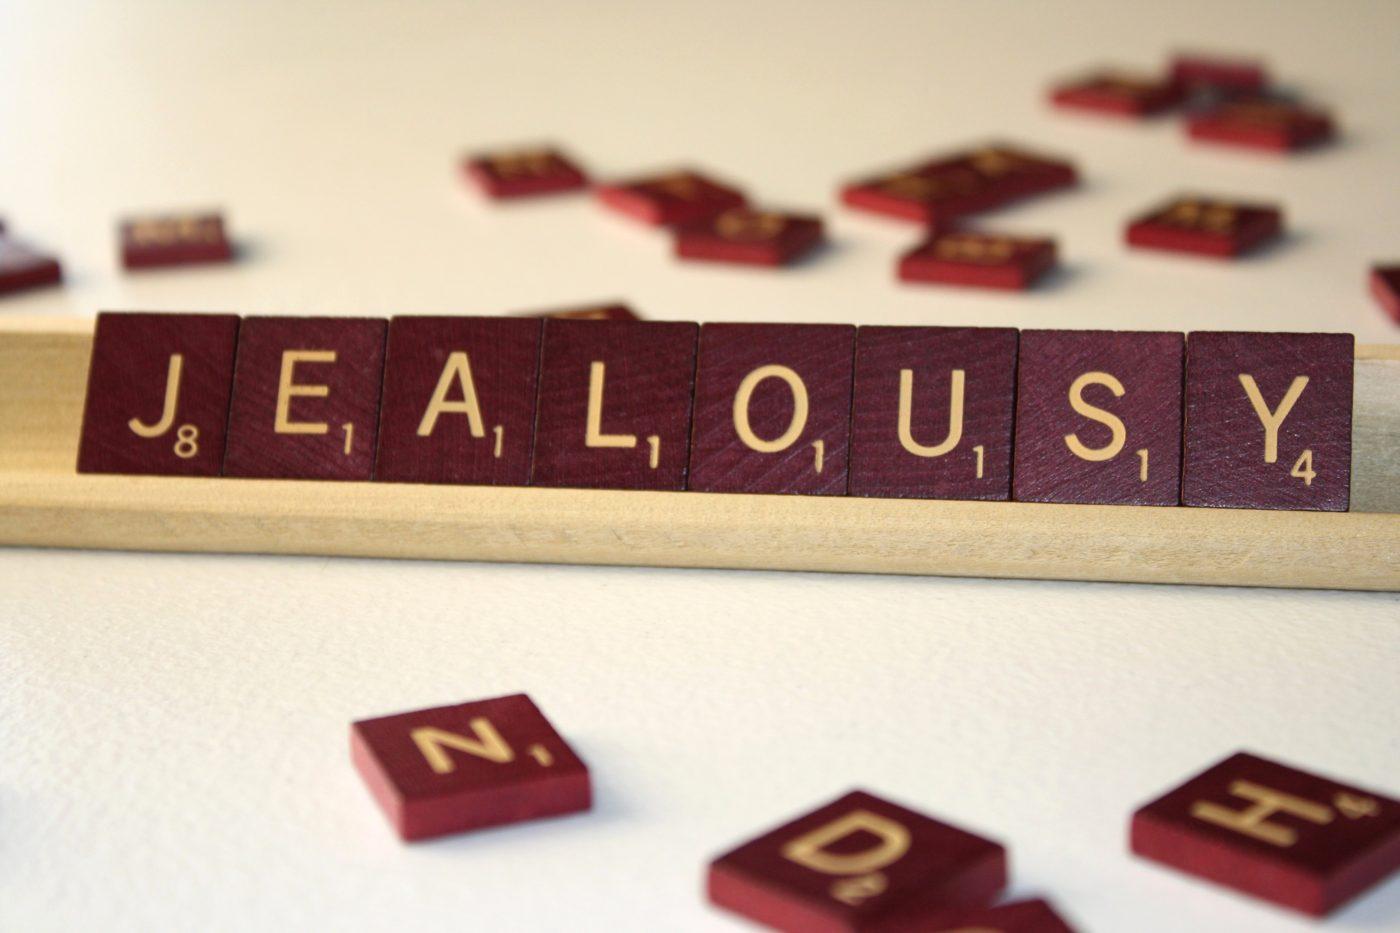 Jealousy is a choice